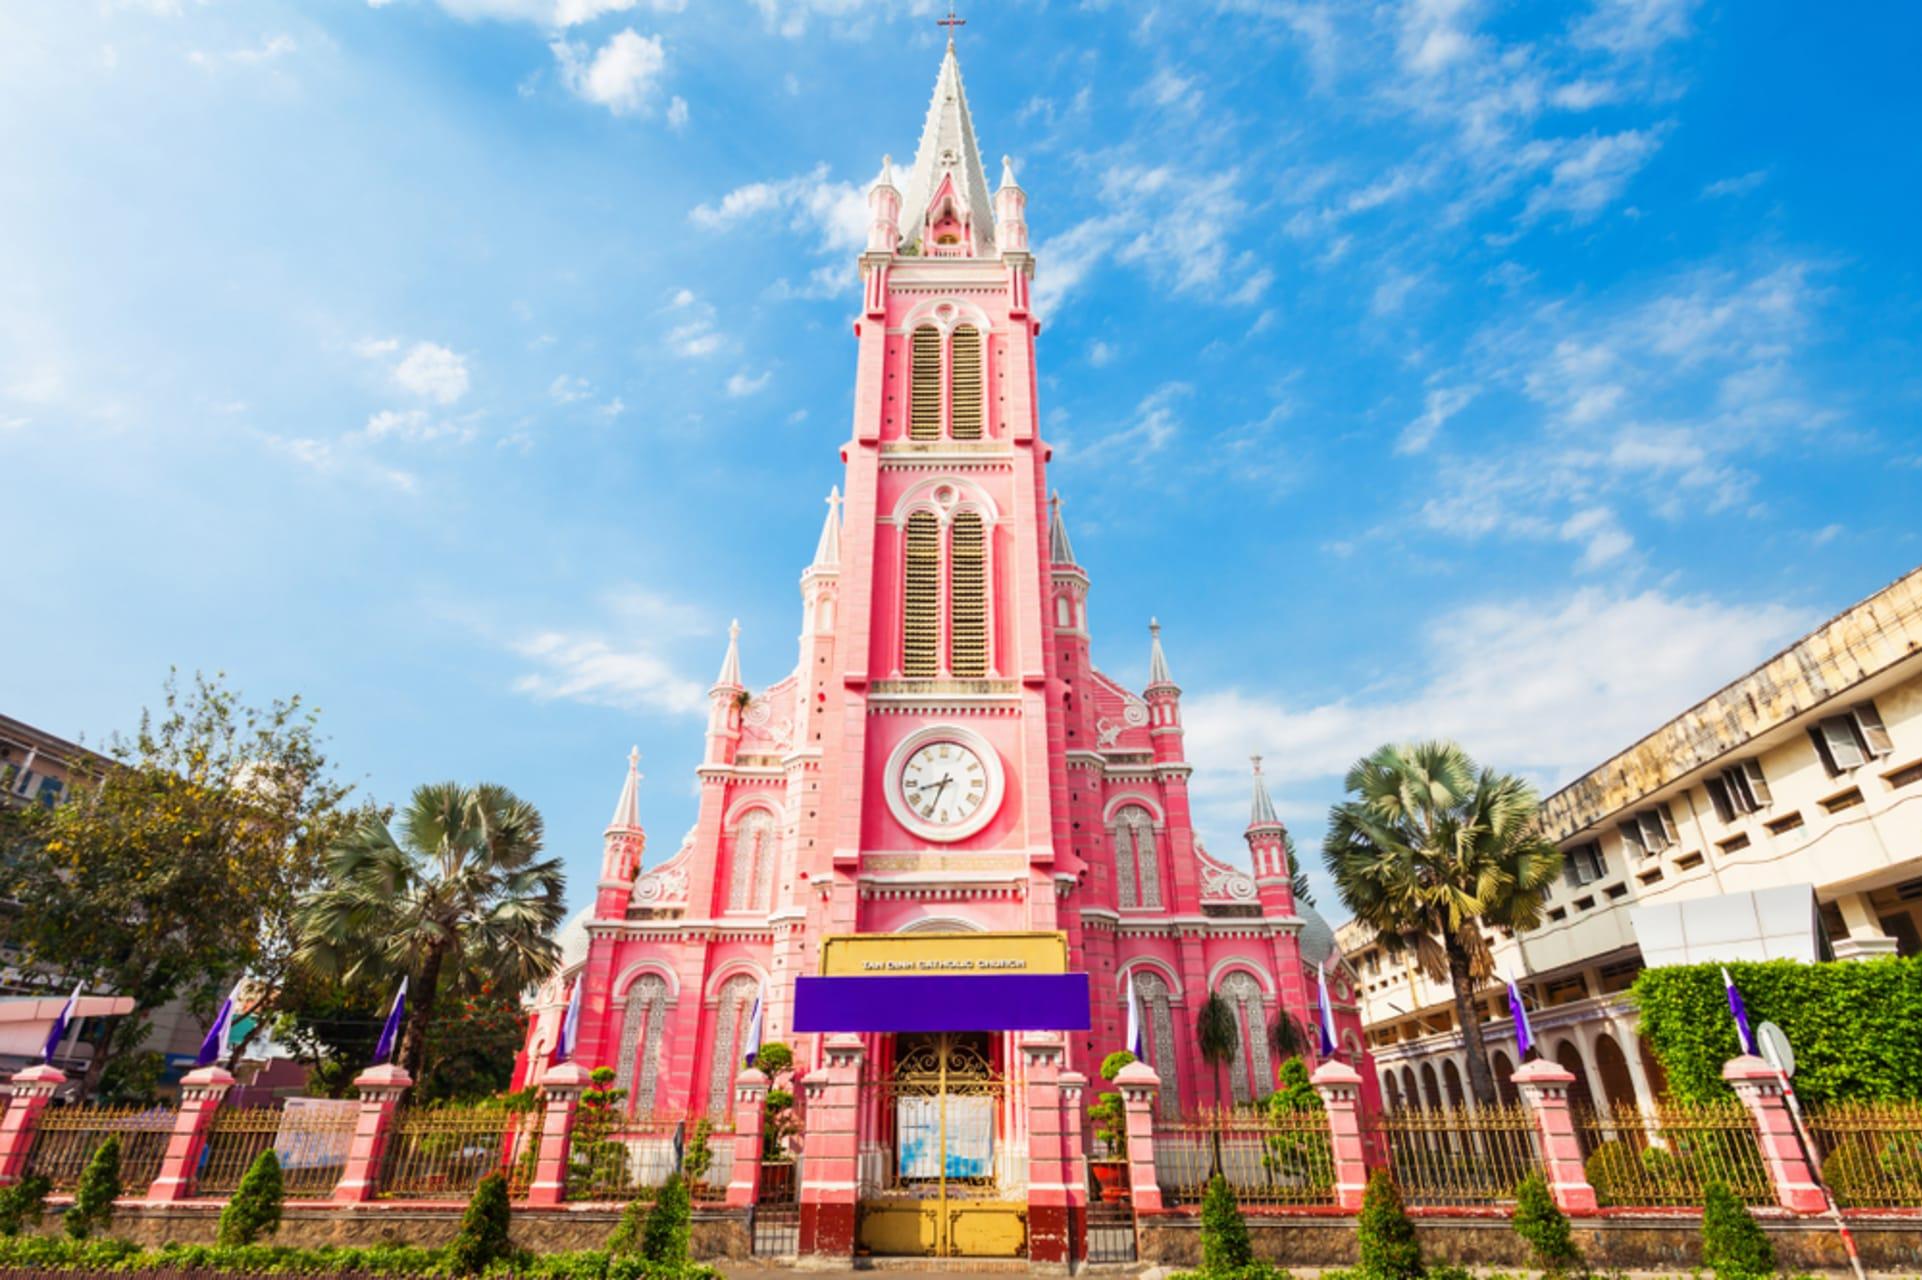 Ho Chi Minh City - Saigon Secret Gems - Day 7: The Pink Church and The Forbidden Hero